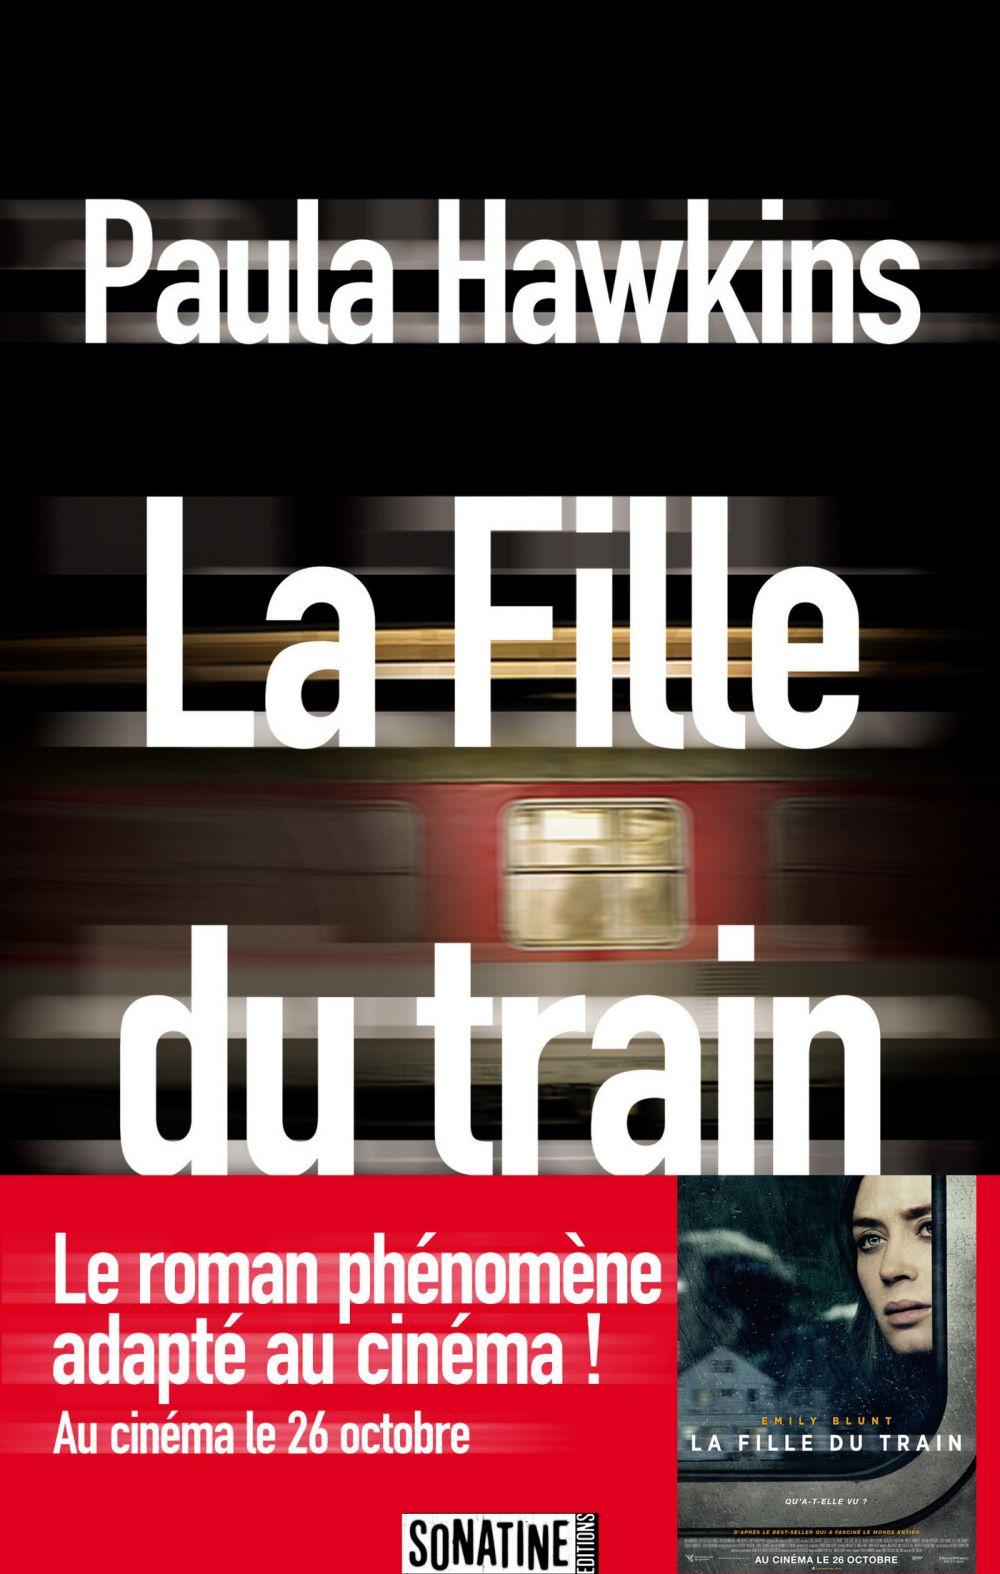 La Fille du train | DANIELLOT, Corinne. Contributeur